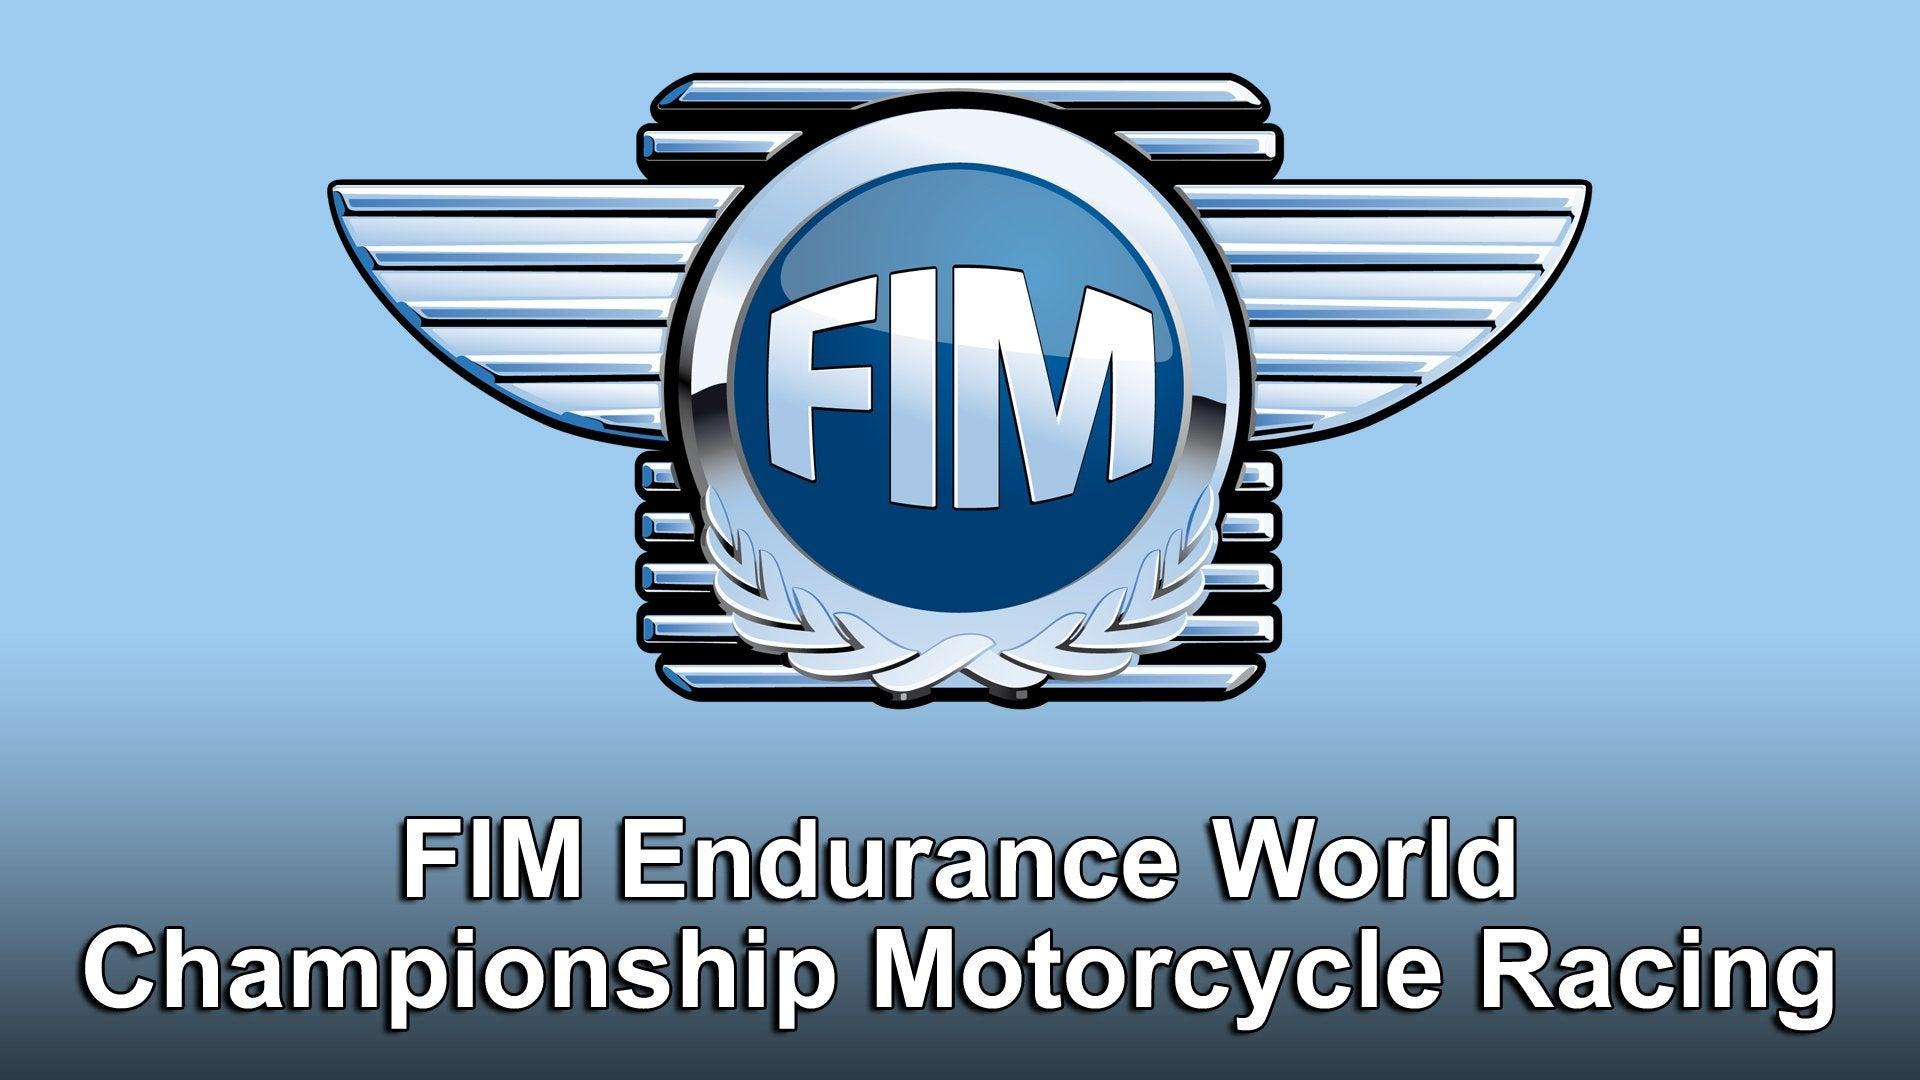 FIM Endurance World Championship Motorcycle Racing